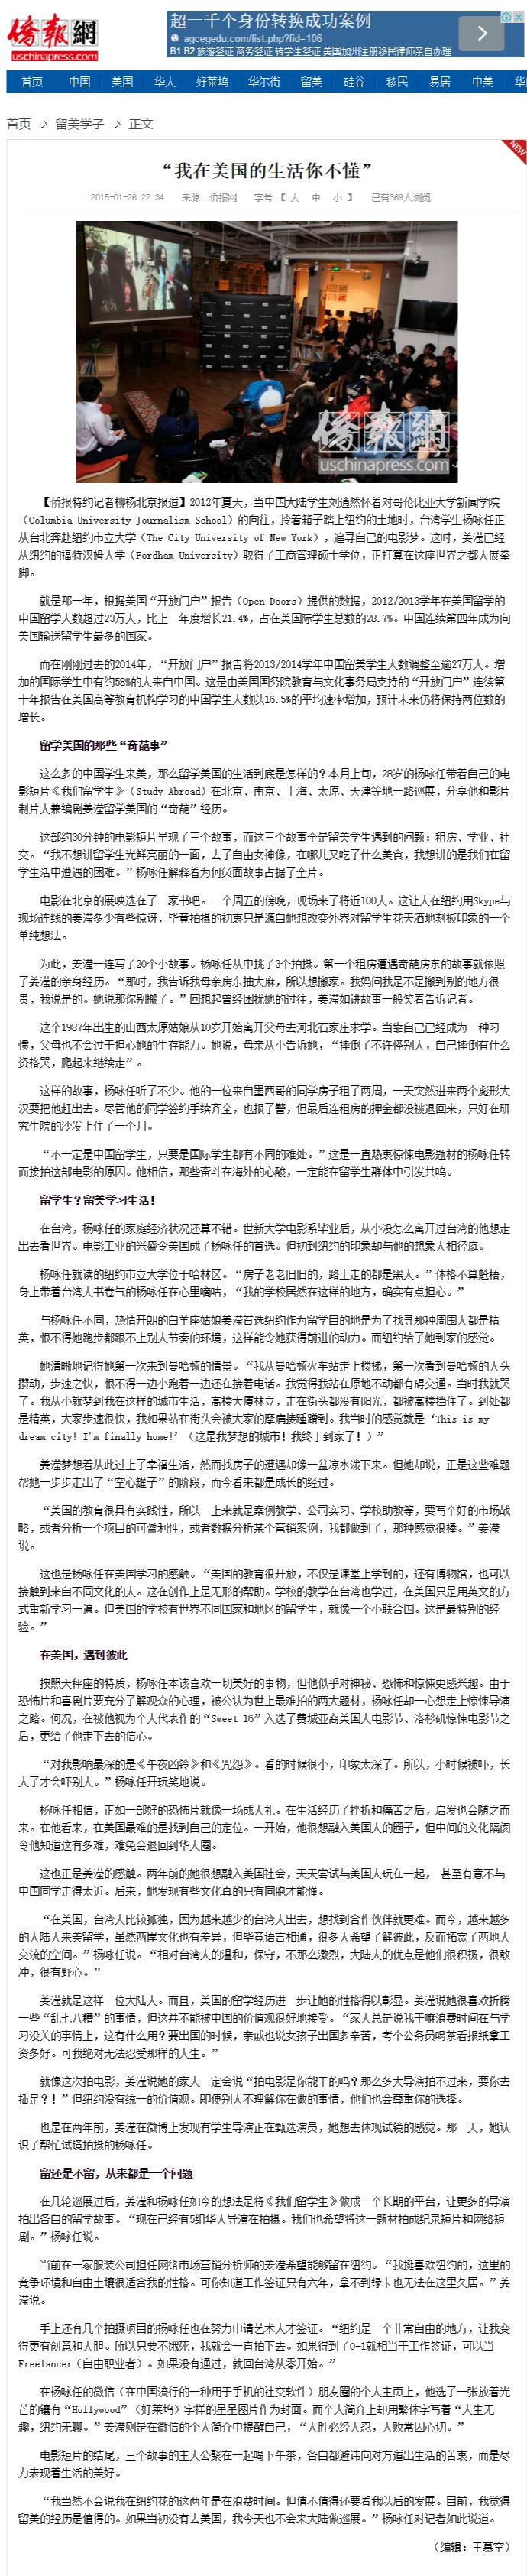 US China Press 1/26/2015